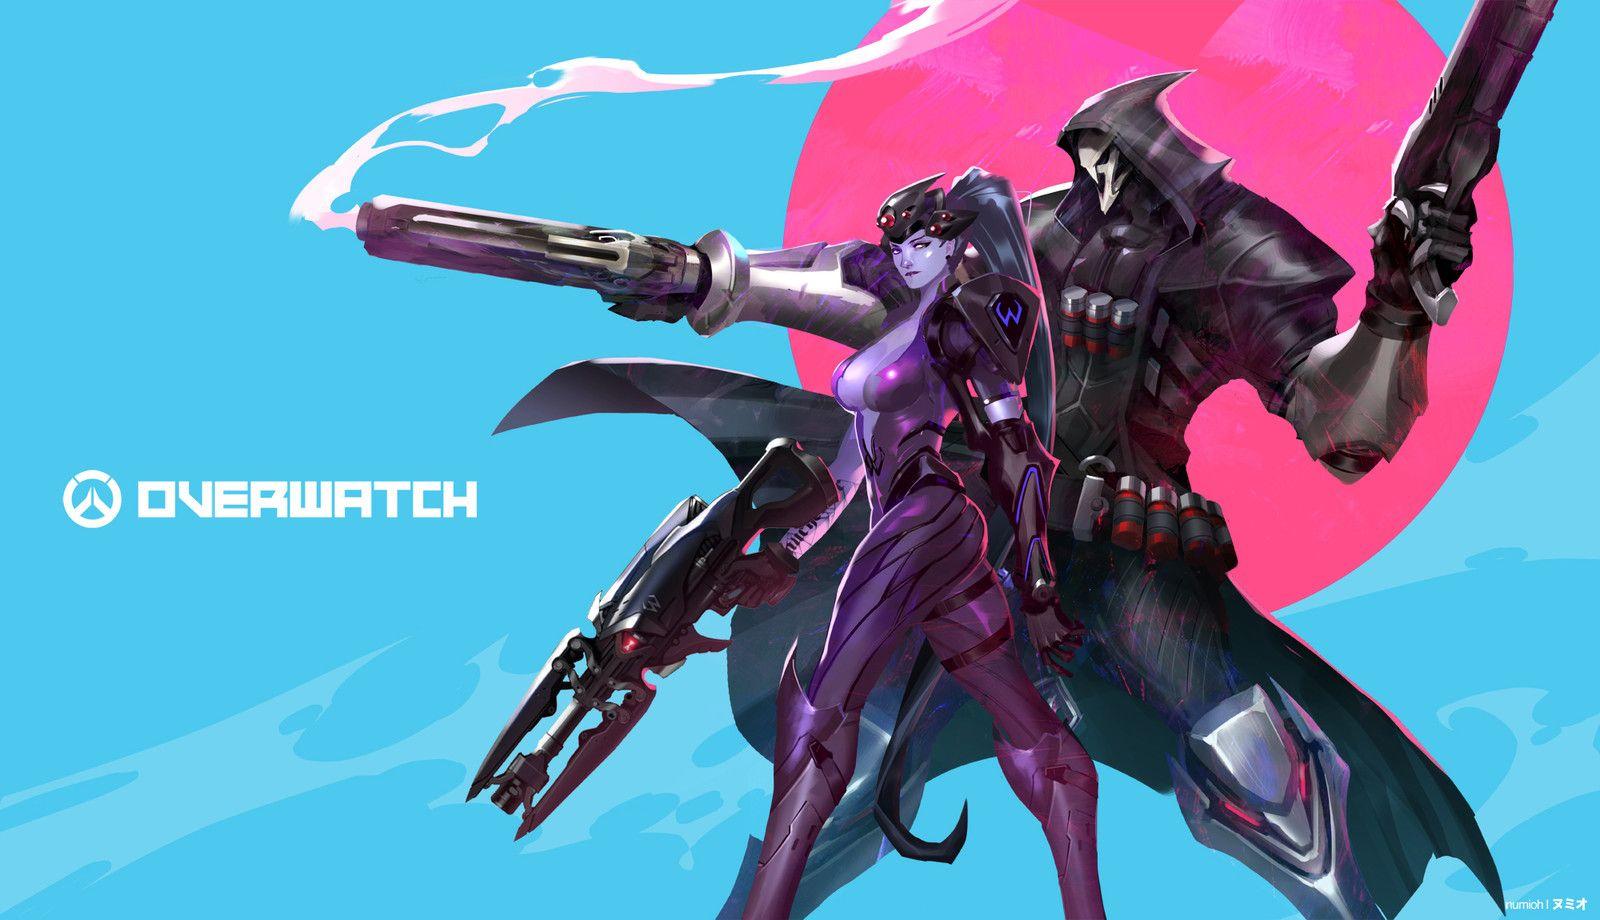 Dual Monitor Wallpaper Overwatch: Widow Maker & Reaper, Hoi Mun On ArtStation At